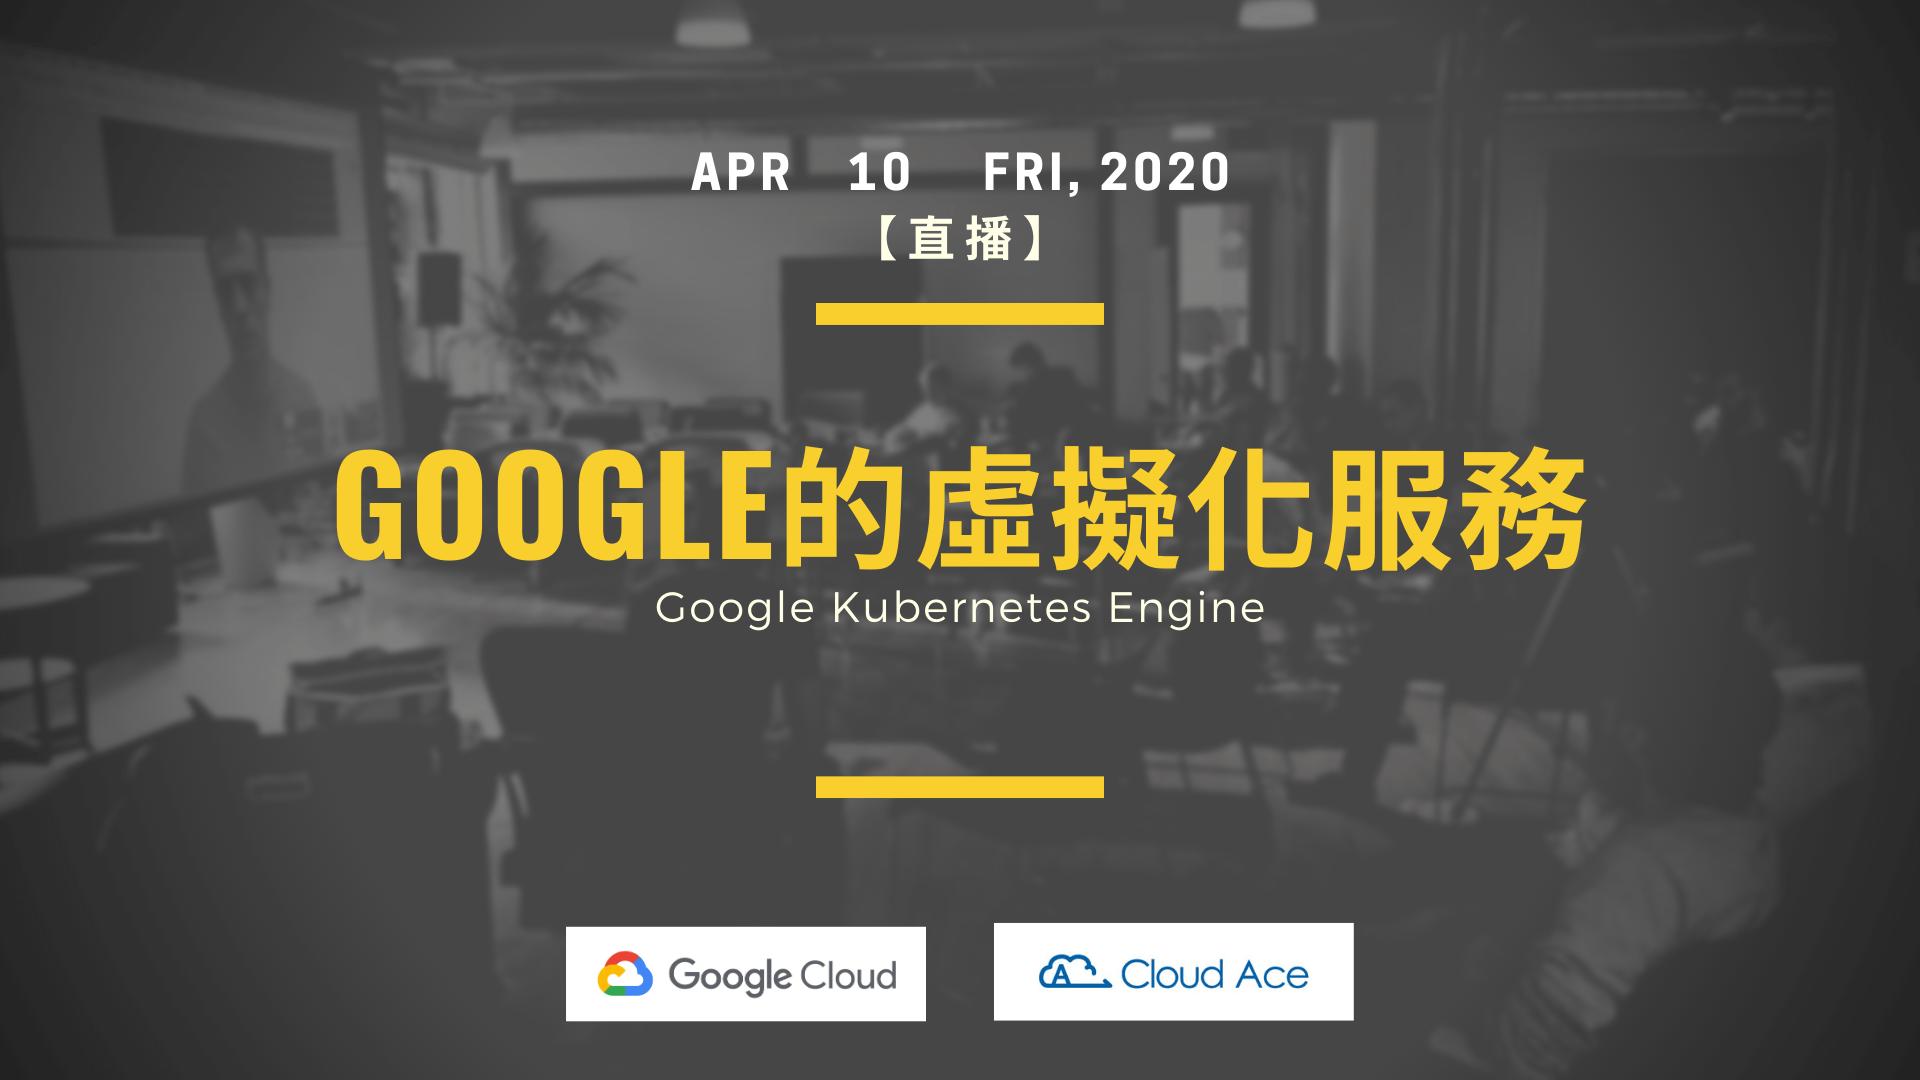 Google的虛擬化服務